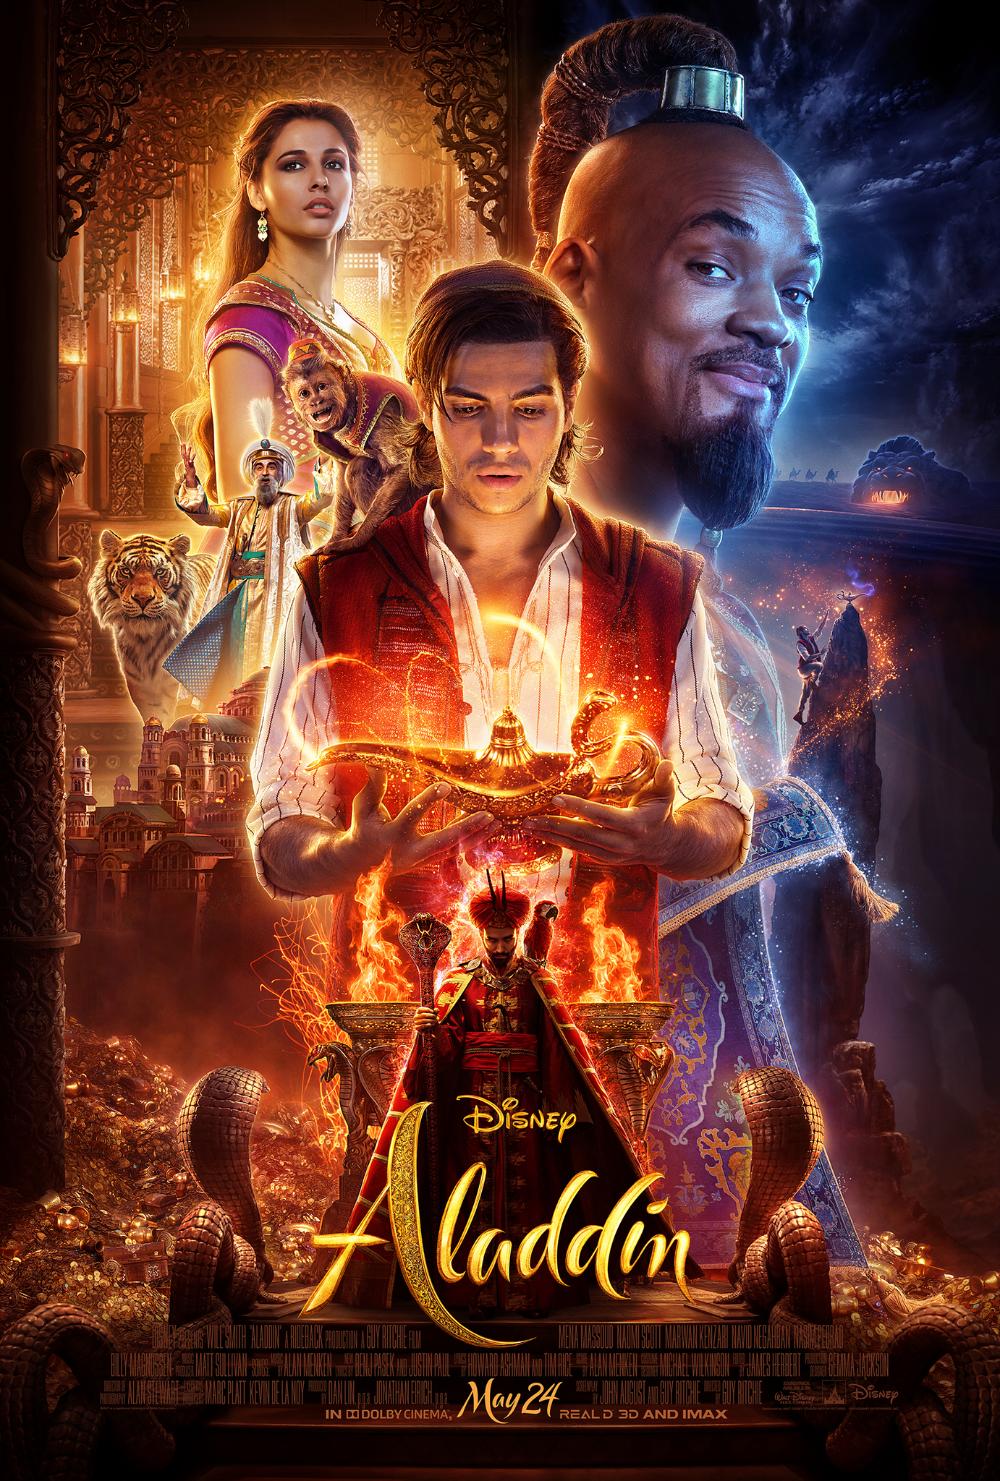 Naomi Scott As Princess Jasmine Aladdin 2019 Png By Nickelbackloverxoxox Naomi Scott Jasmine And Aladdin Costume Princess Jasmine